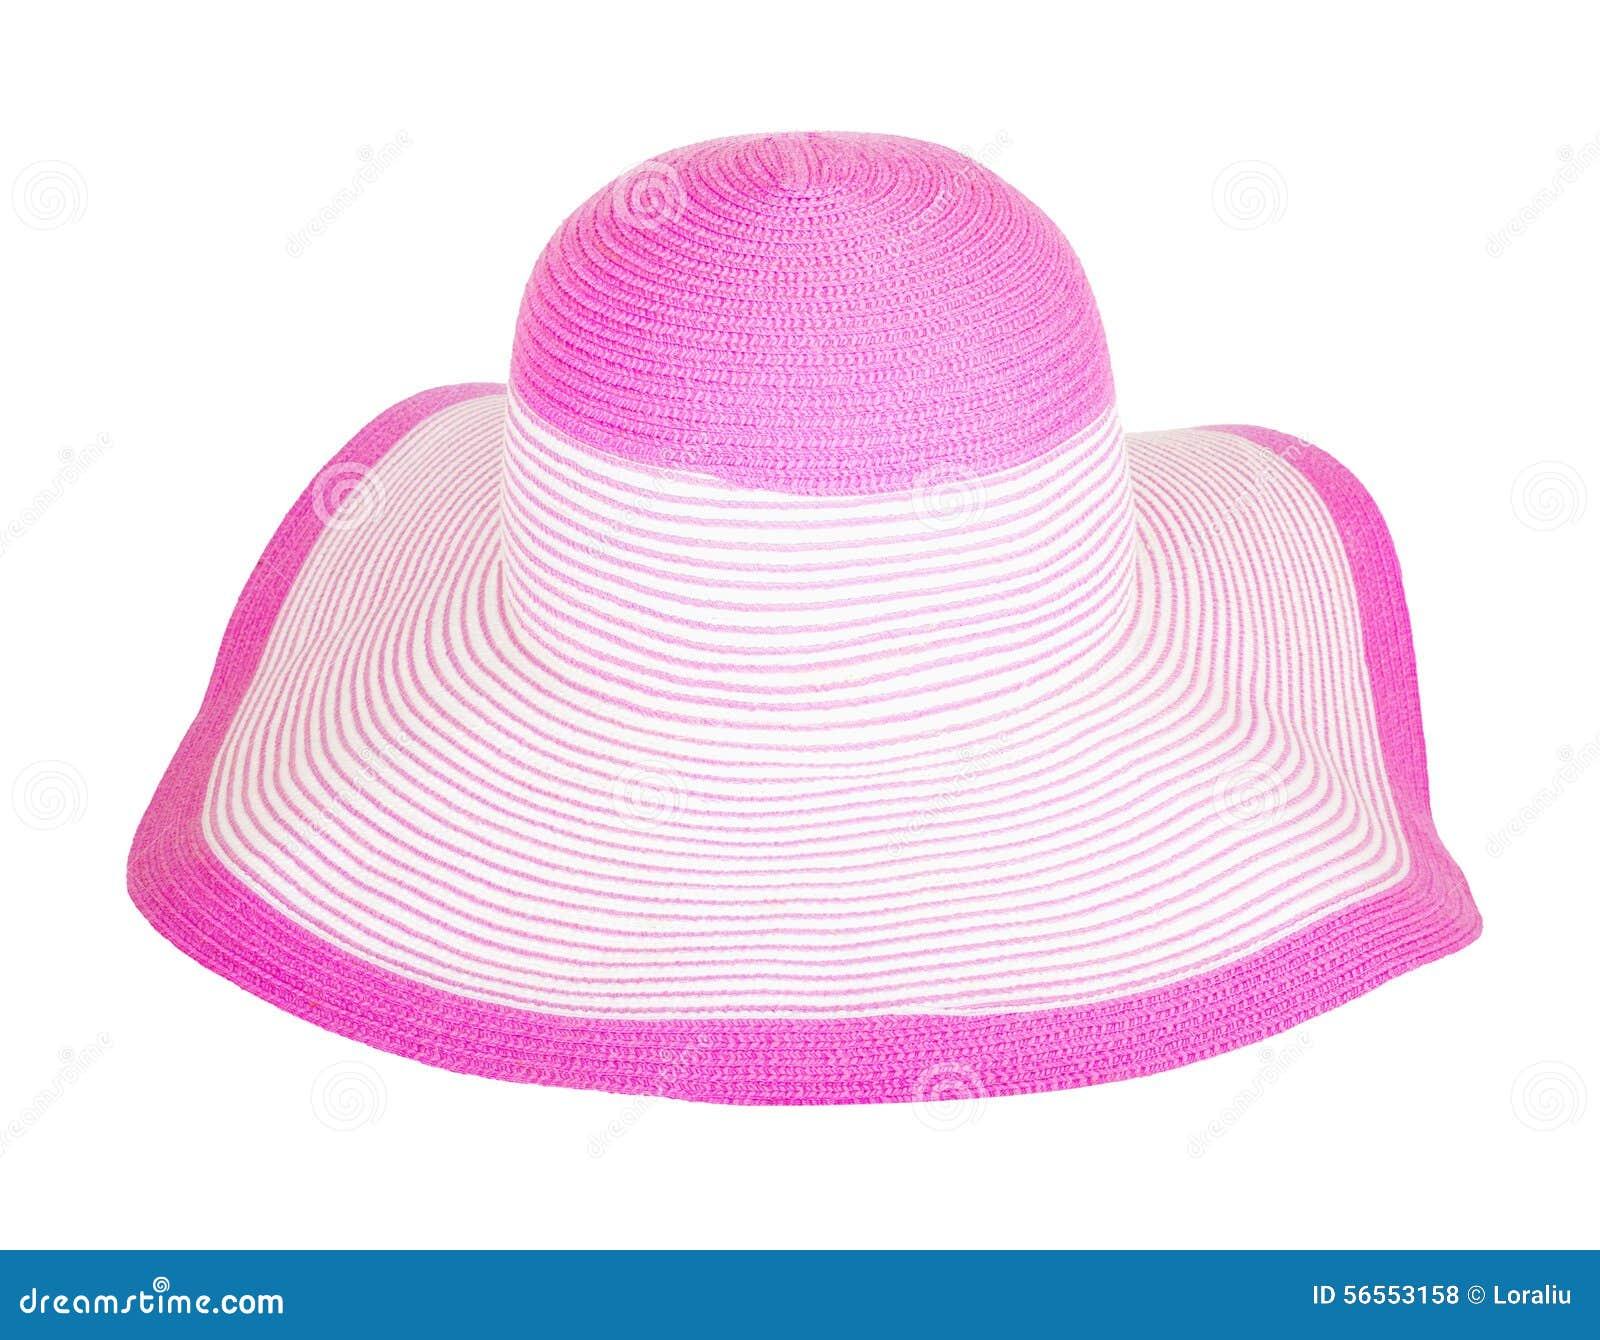 Download Θερινού αχύρου καπέλο που απομονώνεται ρόδινο Στοκ Εικόνες - εικόνα από ενδύματα, hatband: 56553158